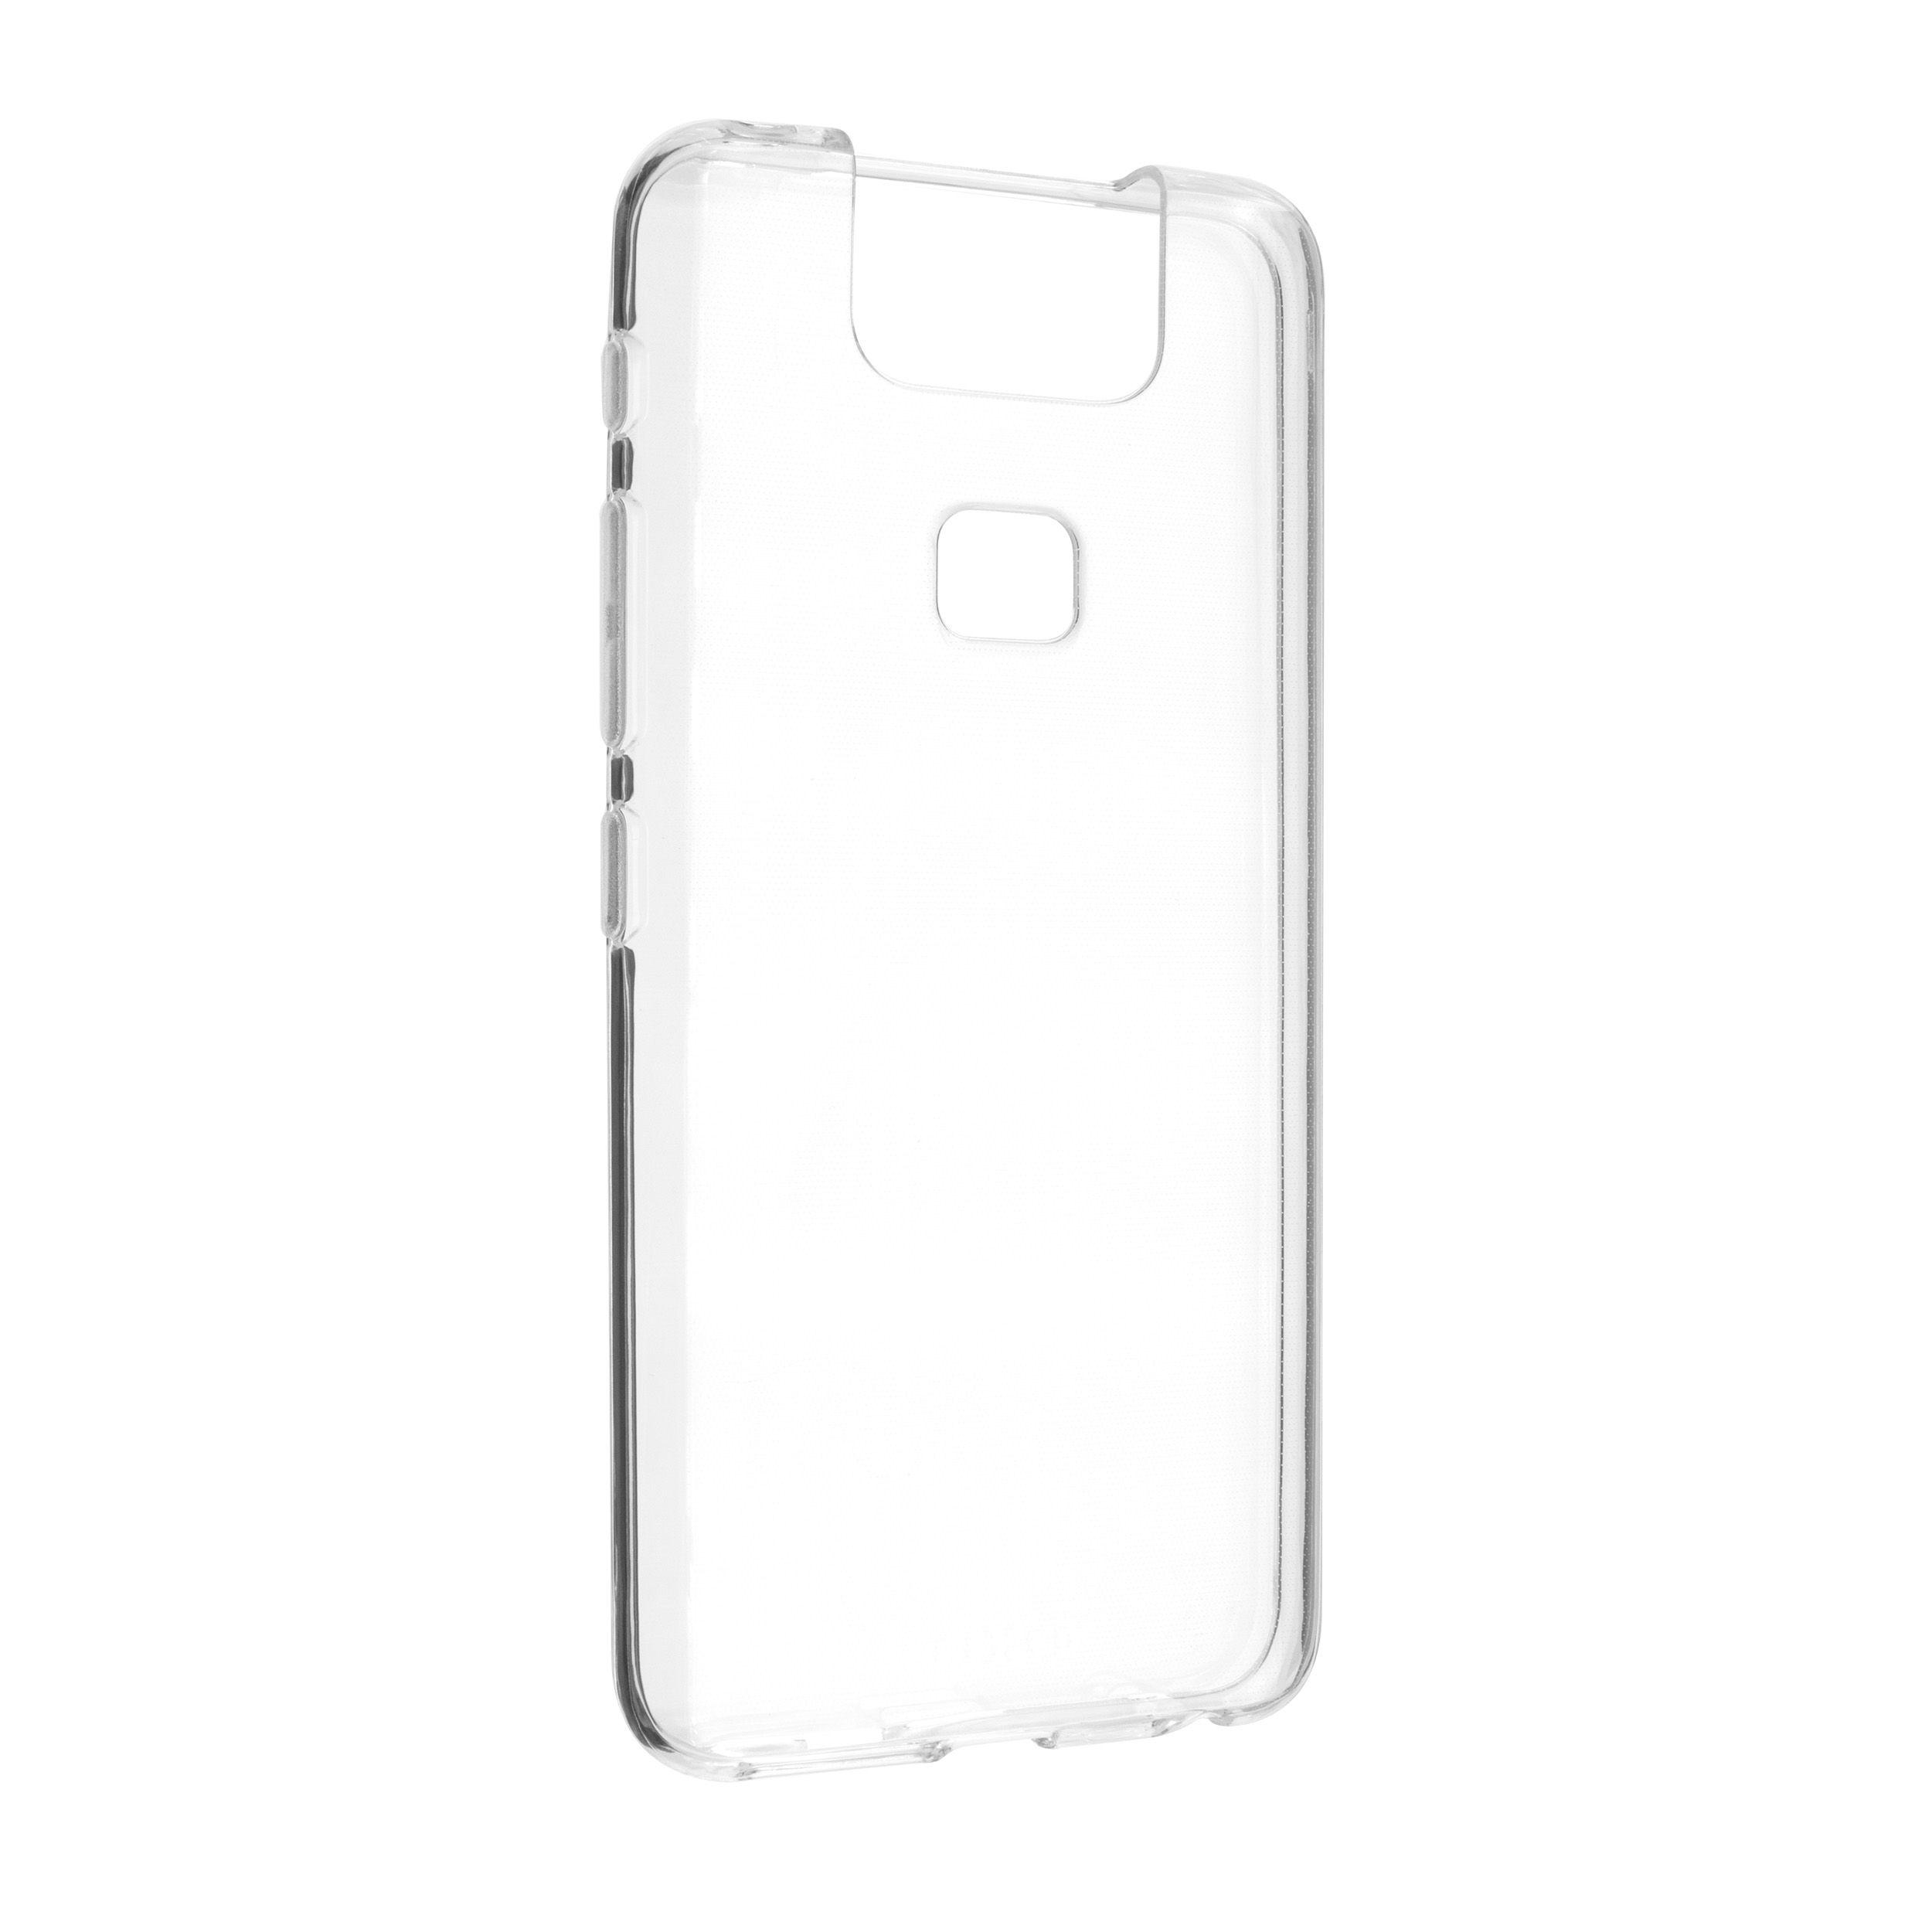 TPU gelové pouzdro FIXED pro Asus ZenFone 6 (ZS630KL), čiré